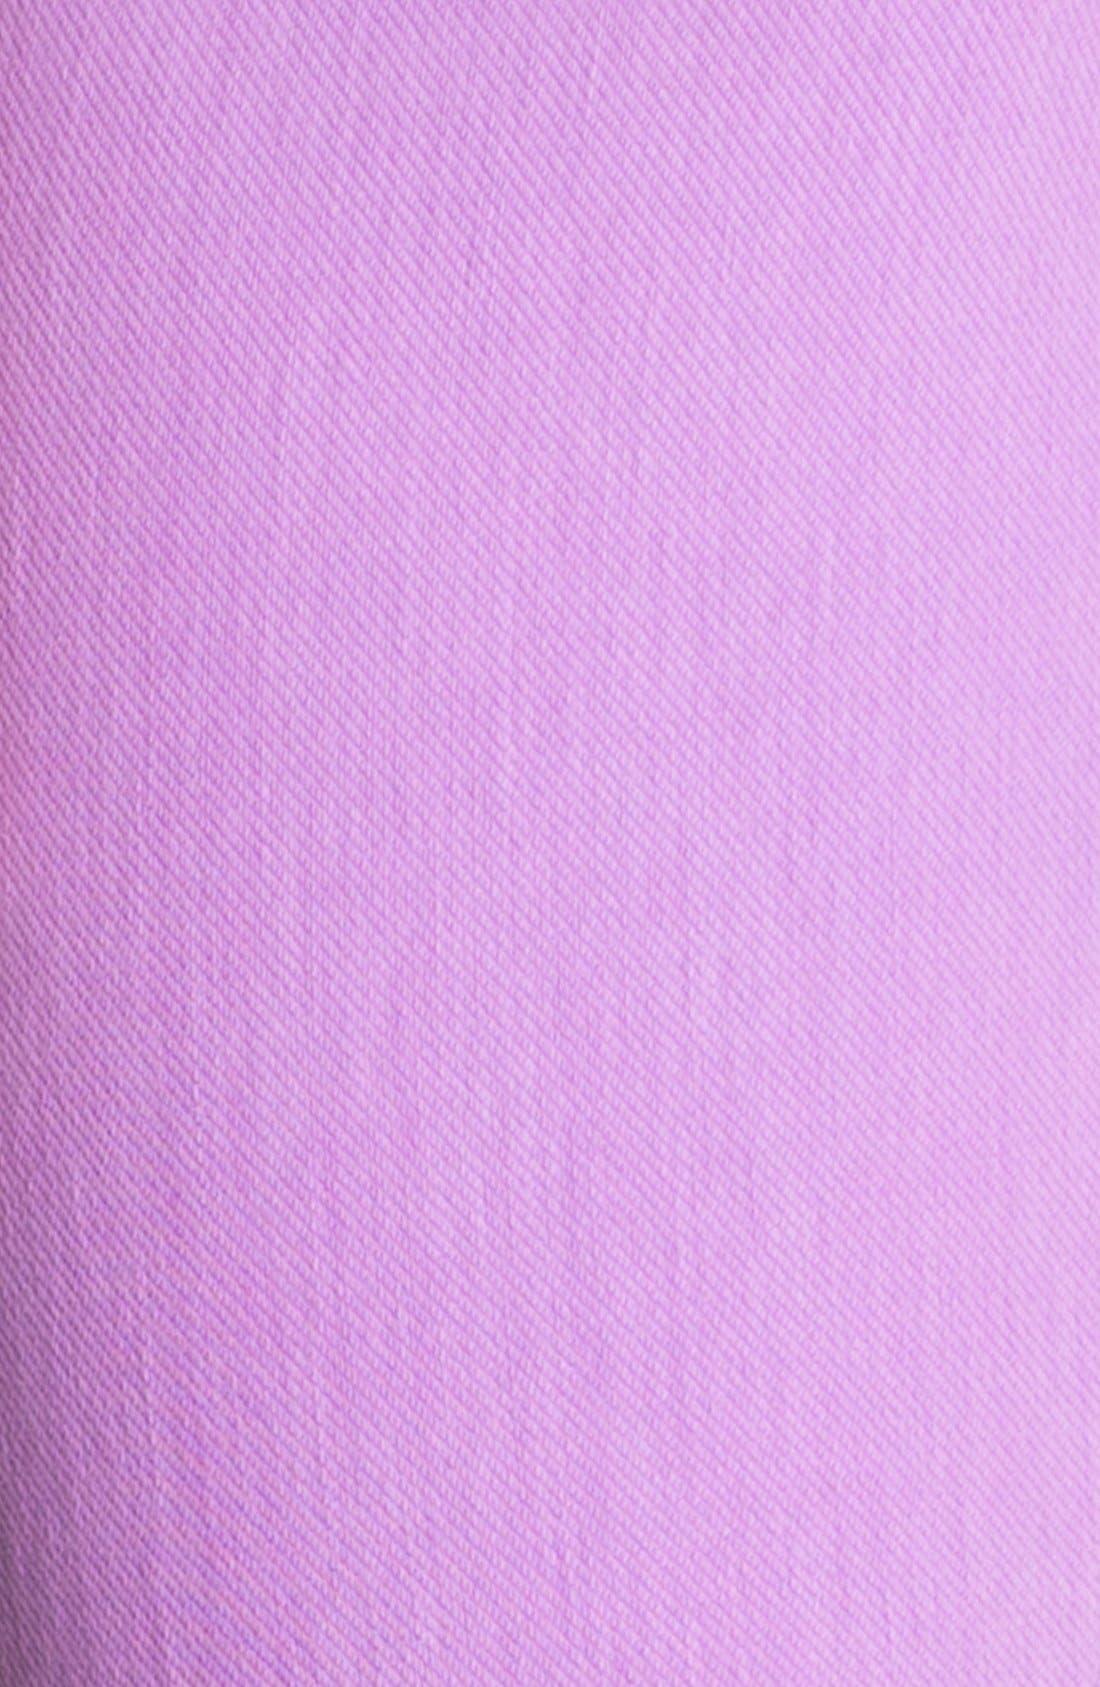 Alternate Image 2  - Hue 'Neon Chinos' Capri Leggings